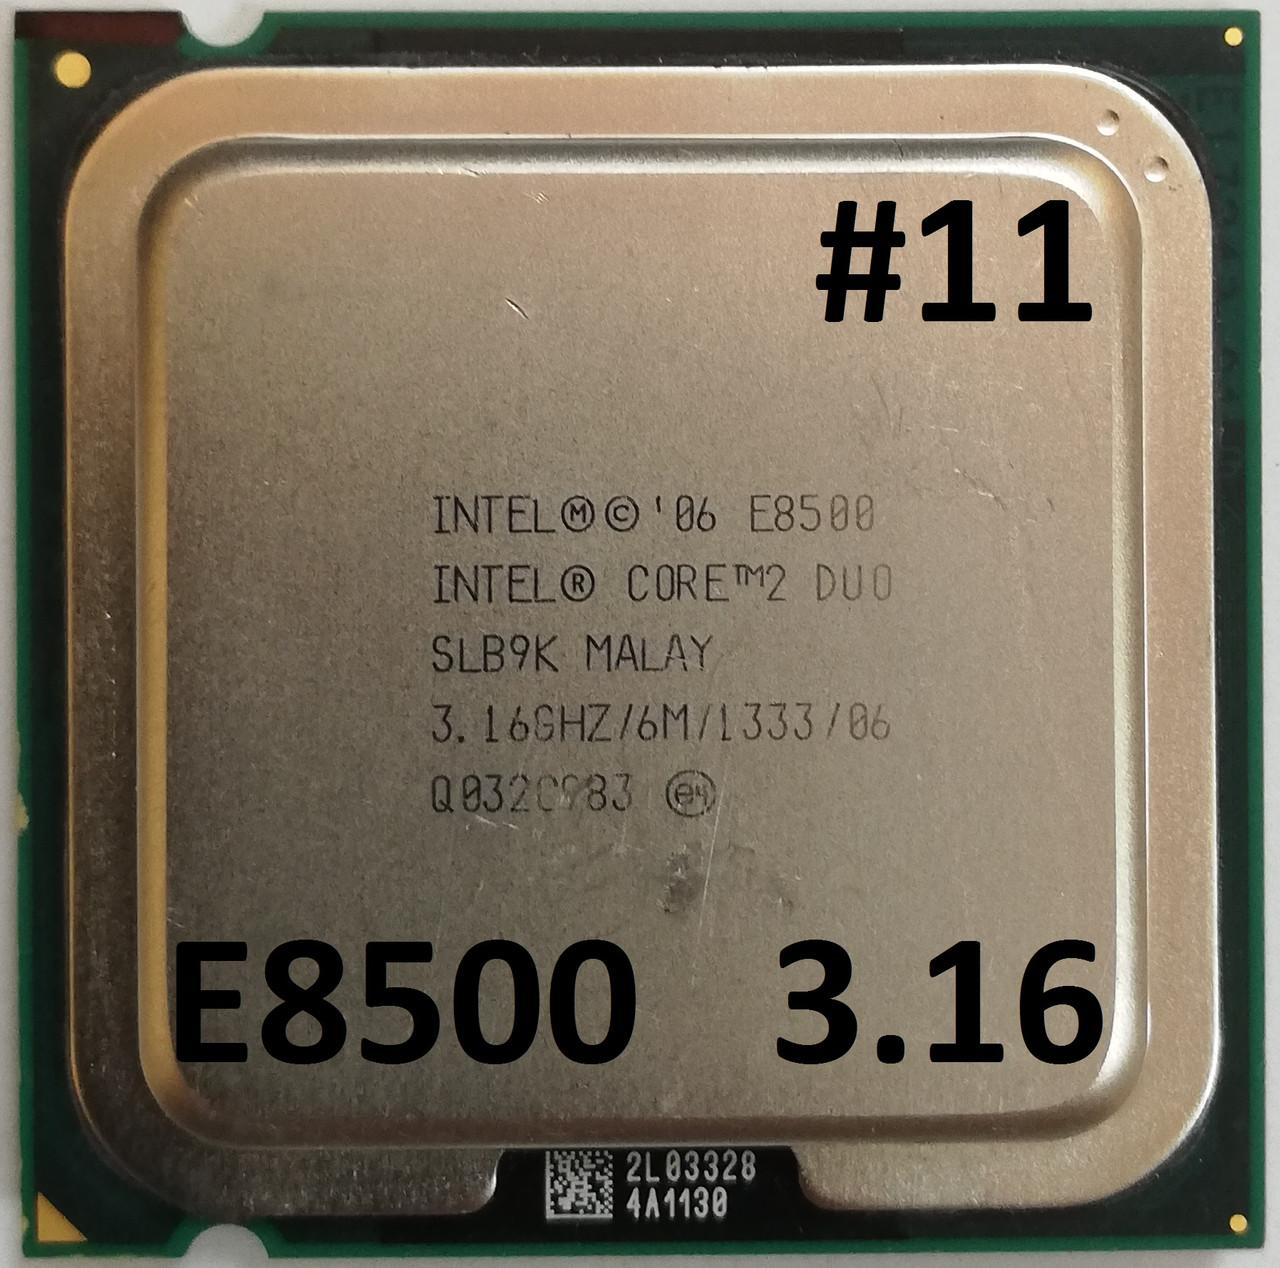 Процессор ЛОТ #11 Intel Core 2 Duo E8500 E0 SLB9K 3.16 GHz 6 MB Cache 1333 MHz FSB Socket 775 Б/У